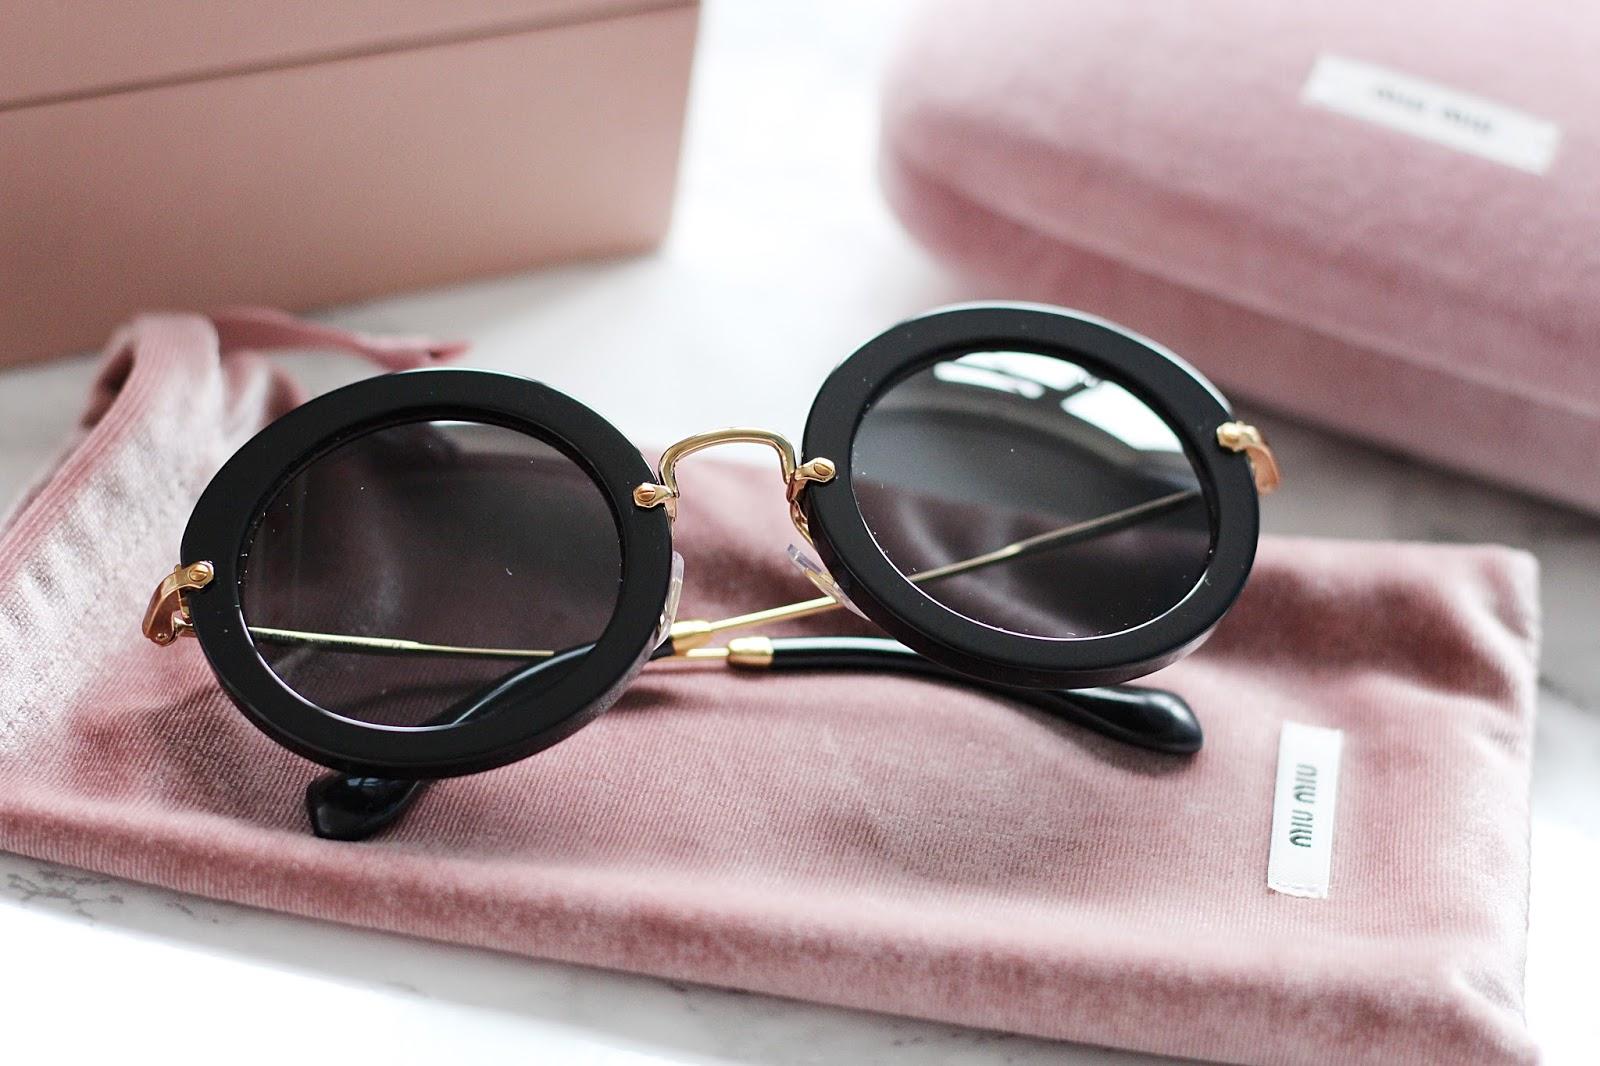 Miu Miu Sunglasses 2017 Ebay